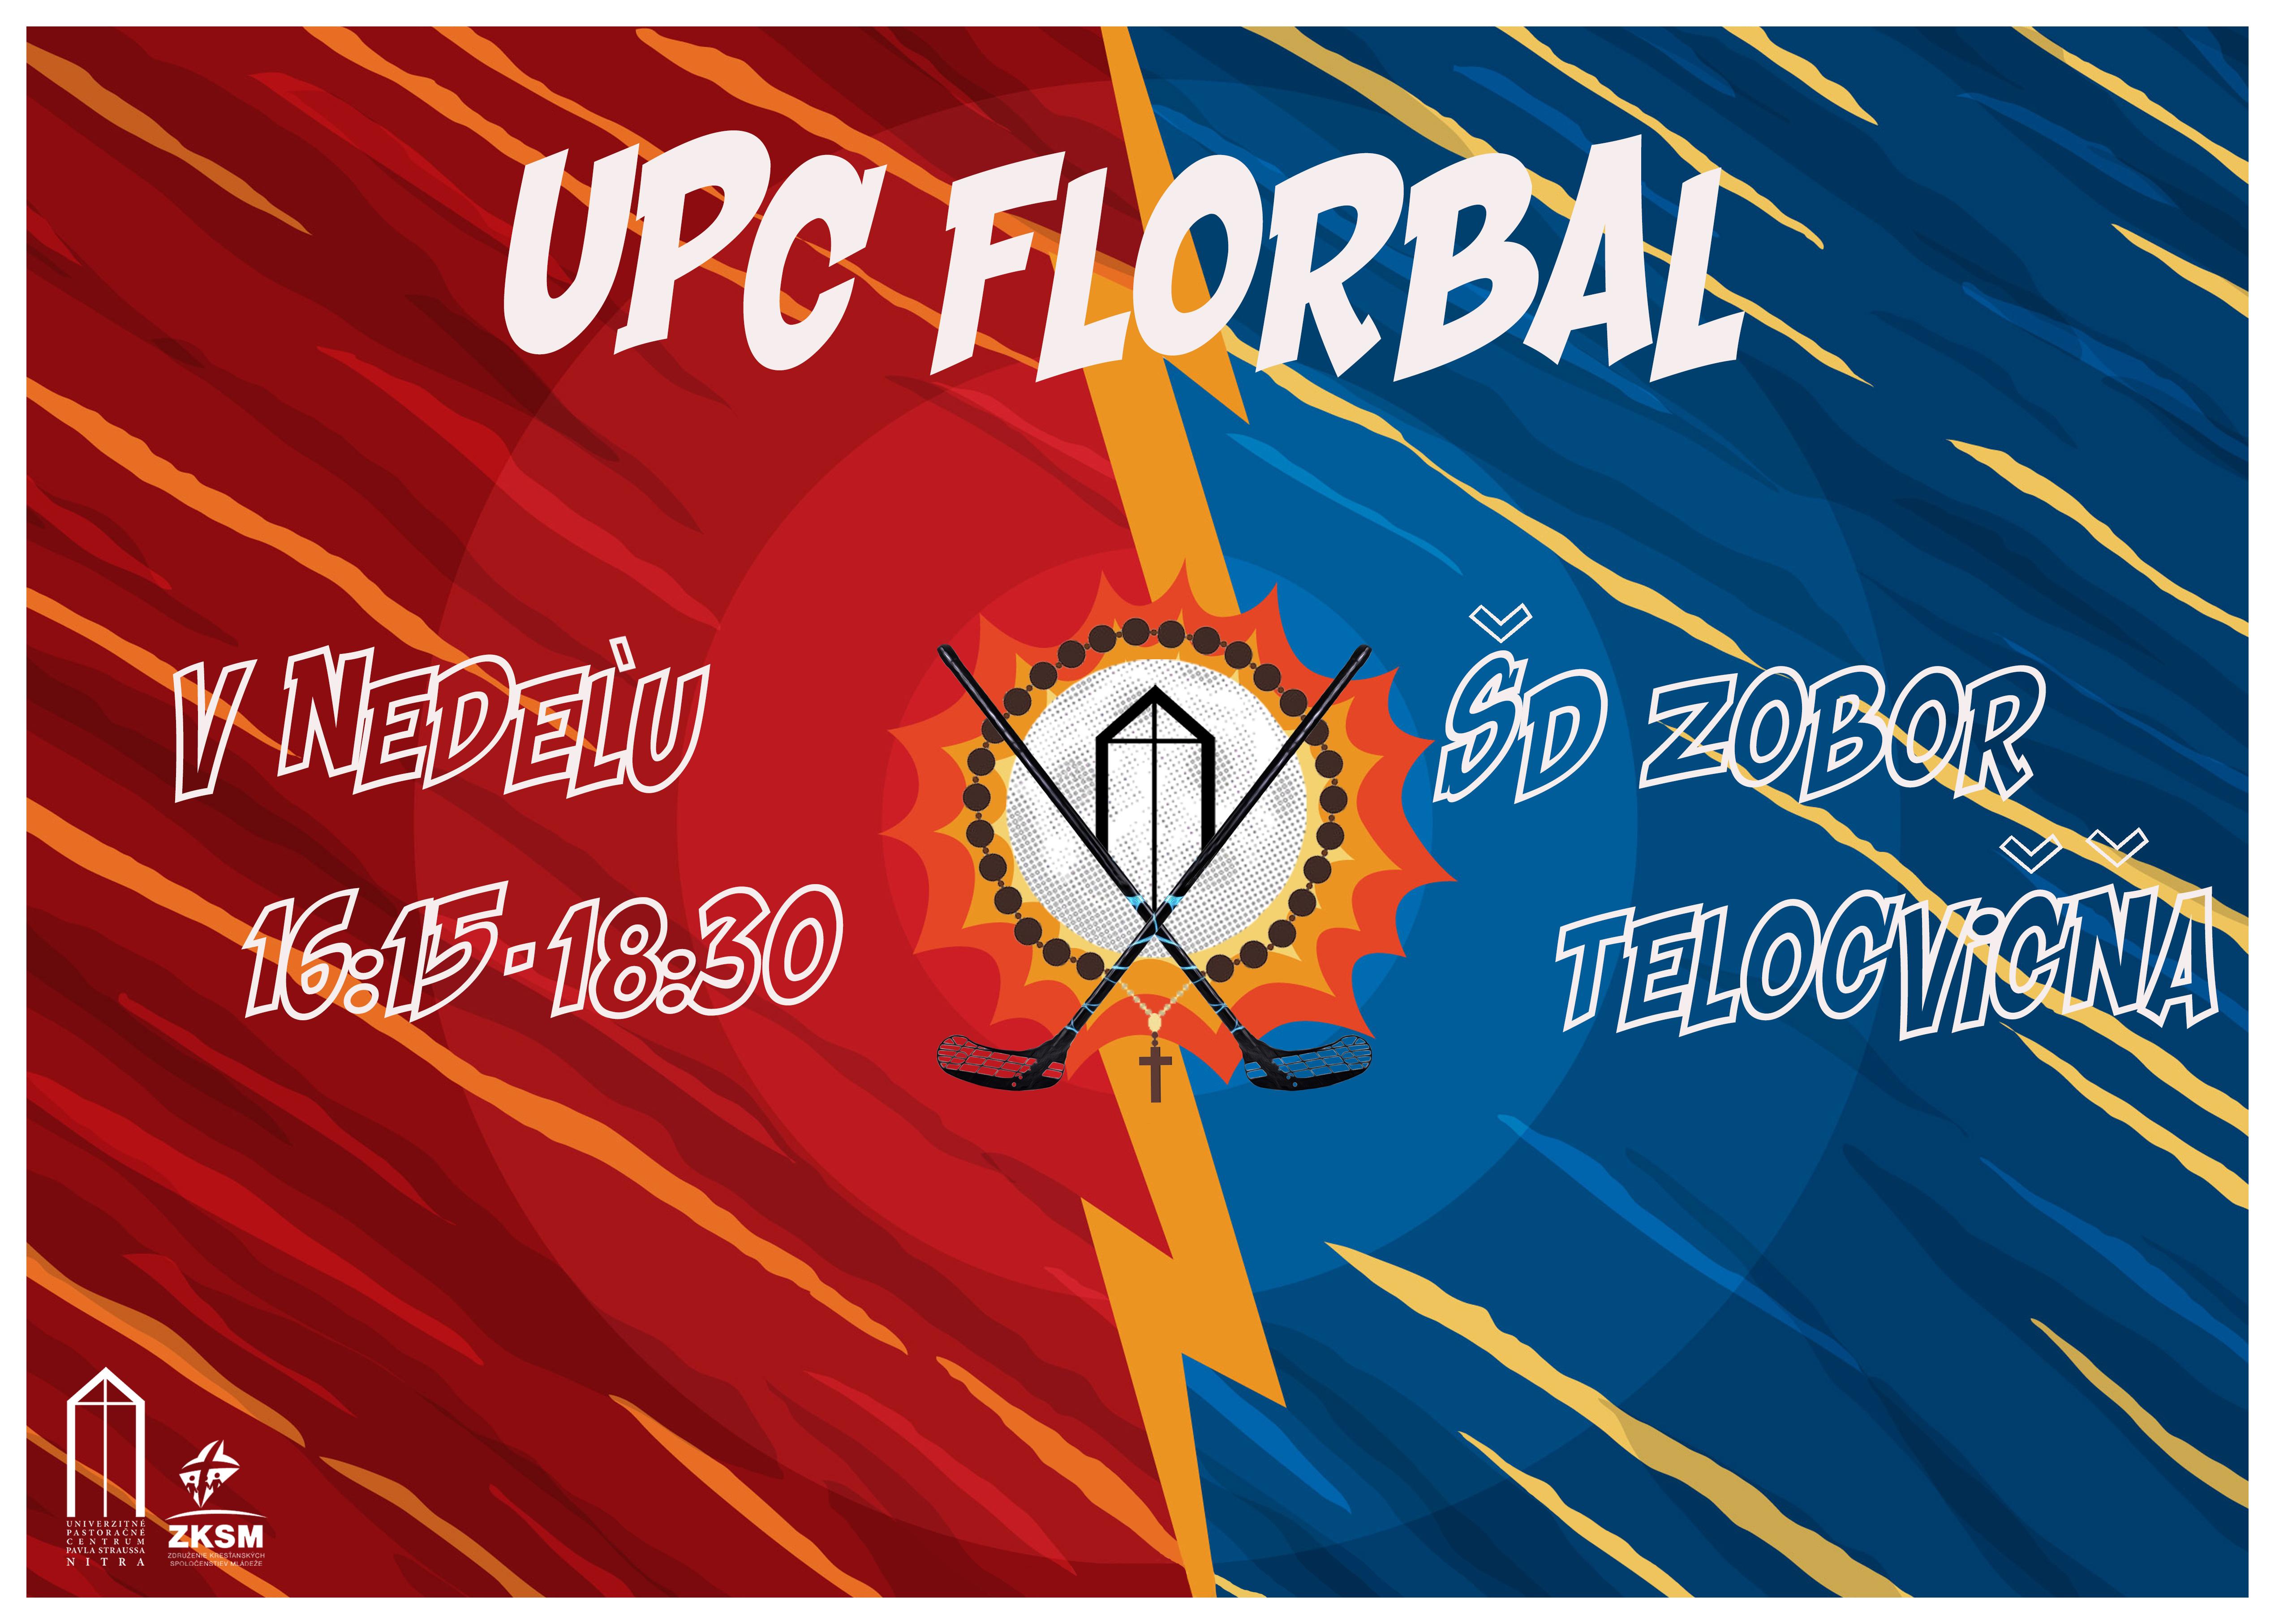 UPC Florbal